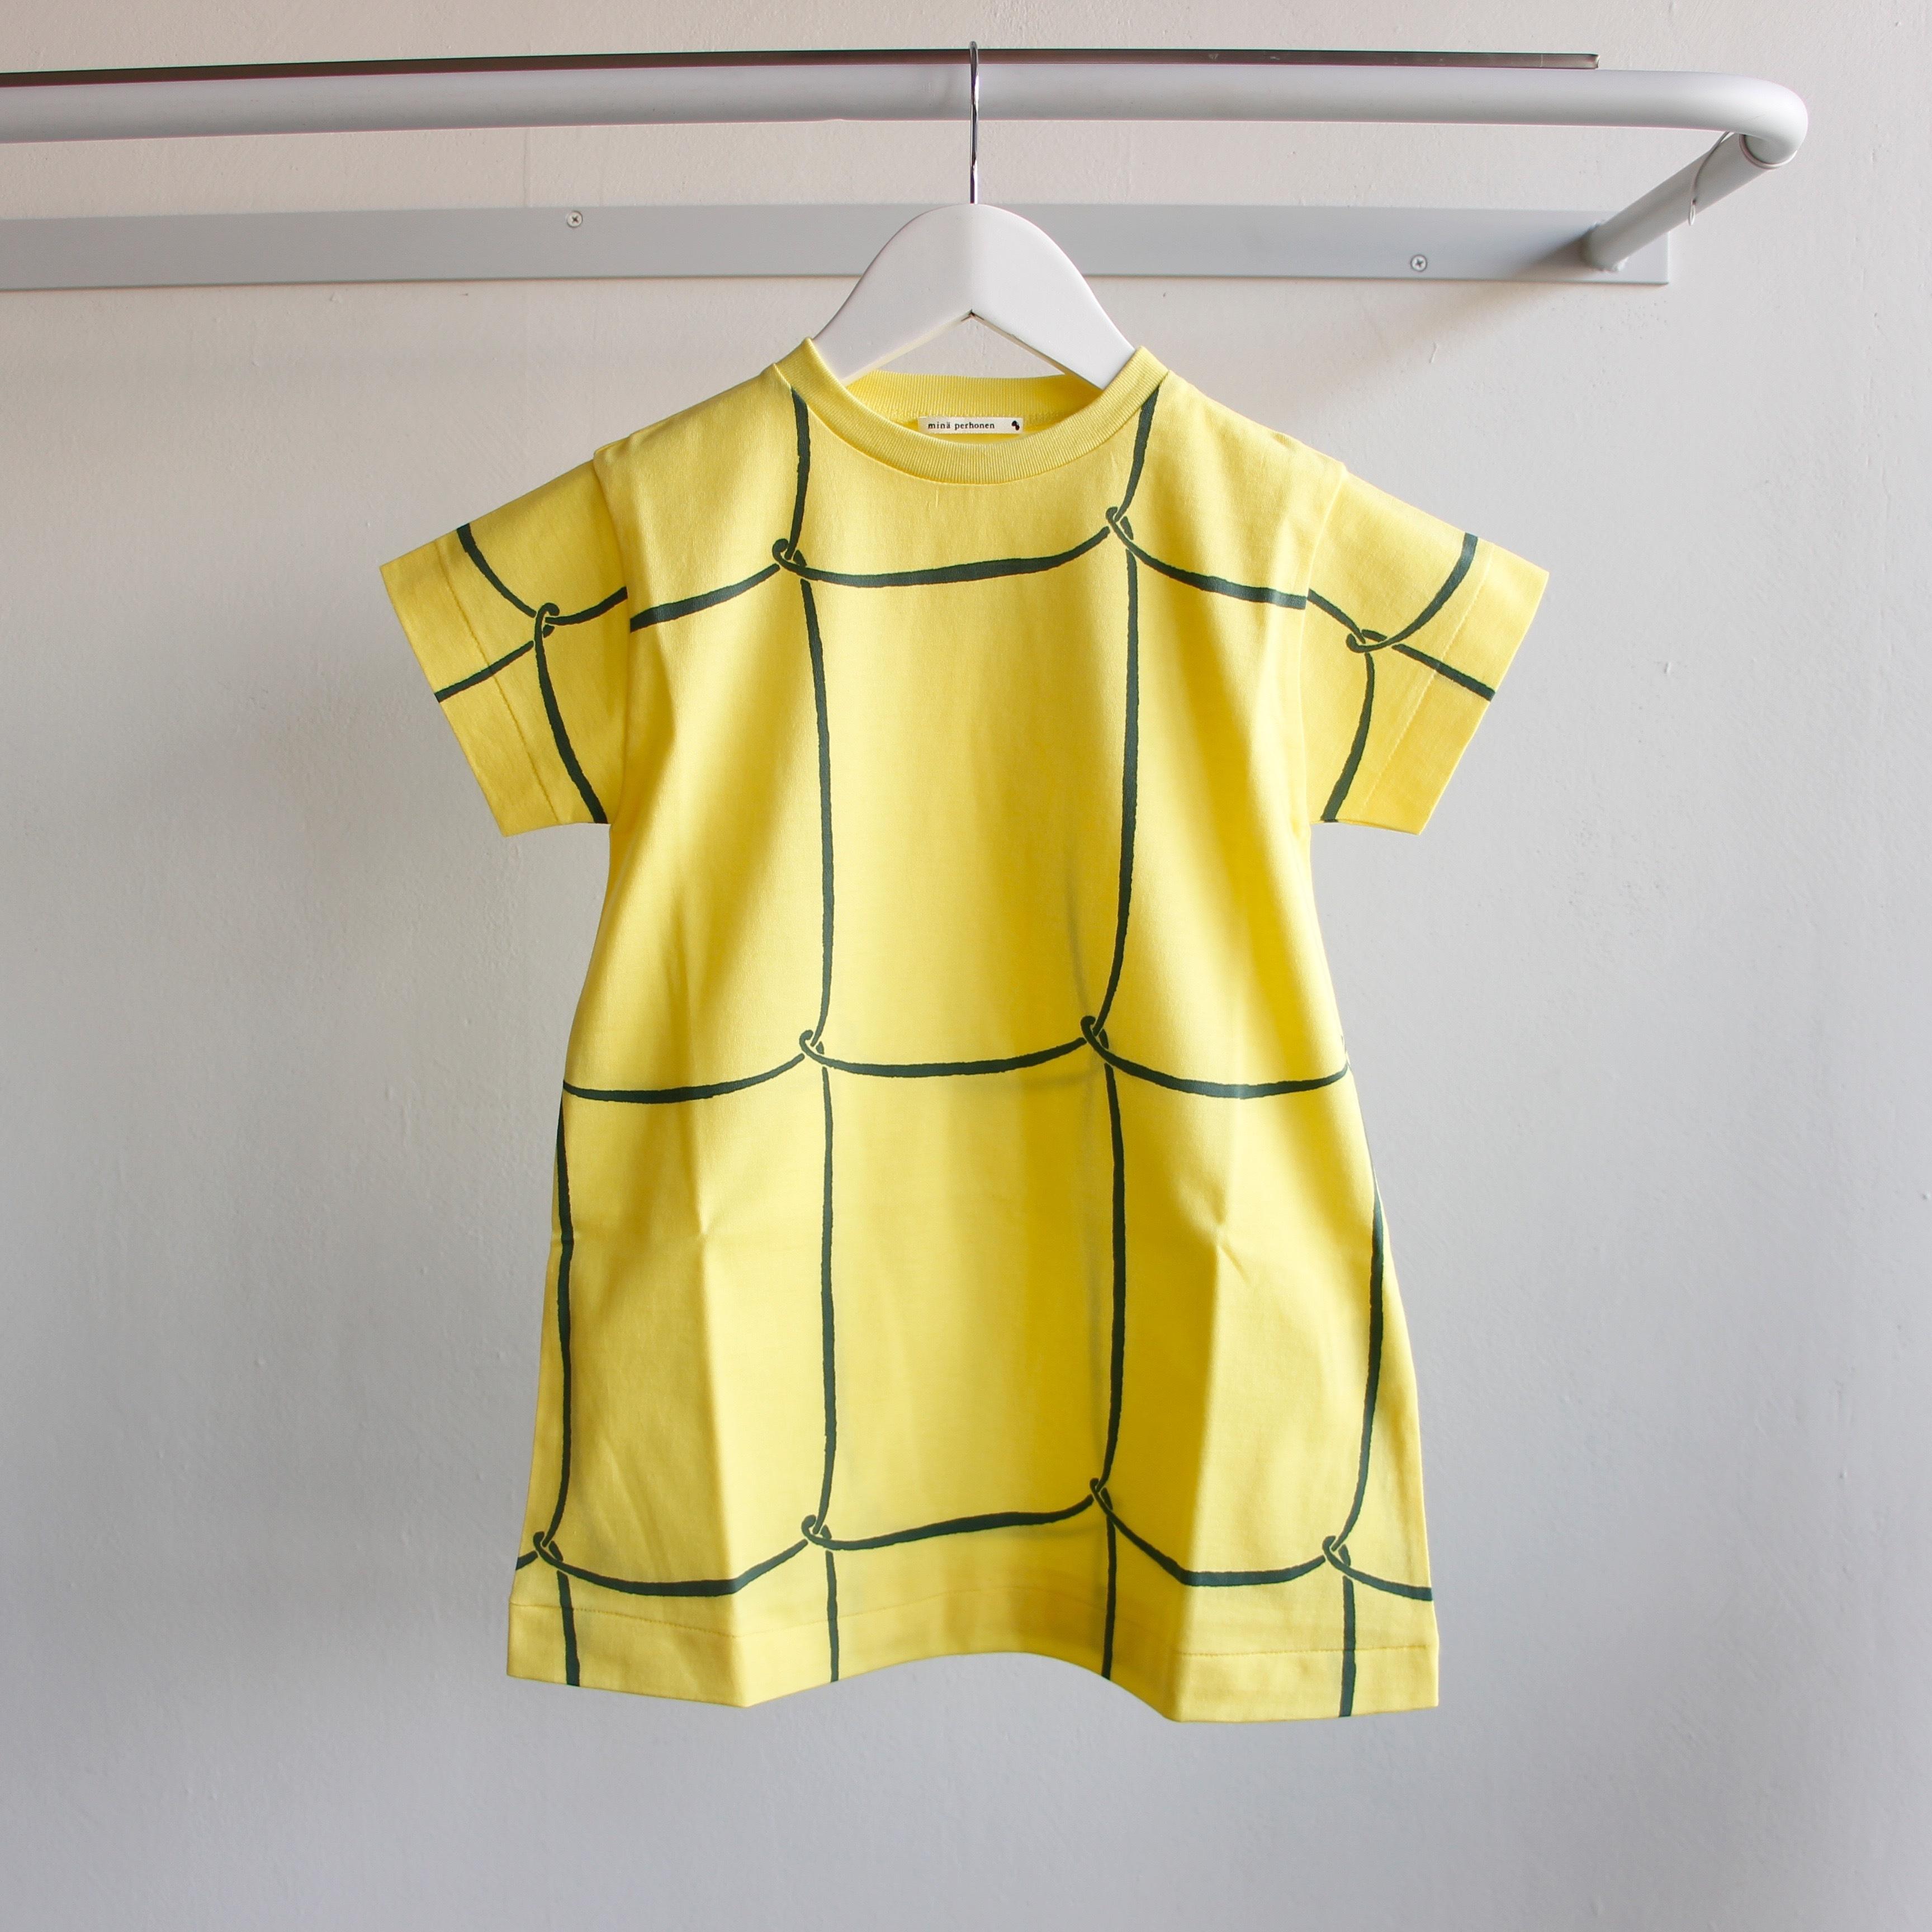 《mina perhonen 2018SS》ribbon frame ワンピース / yellow / 110-130cm